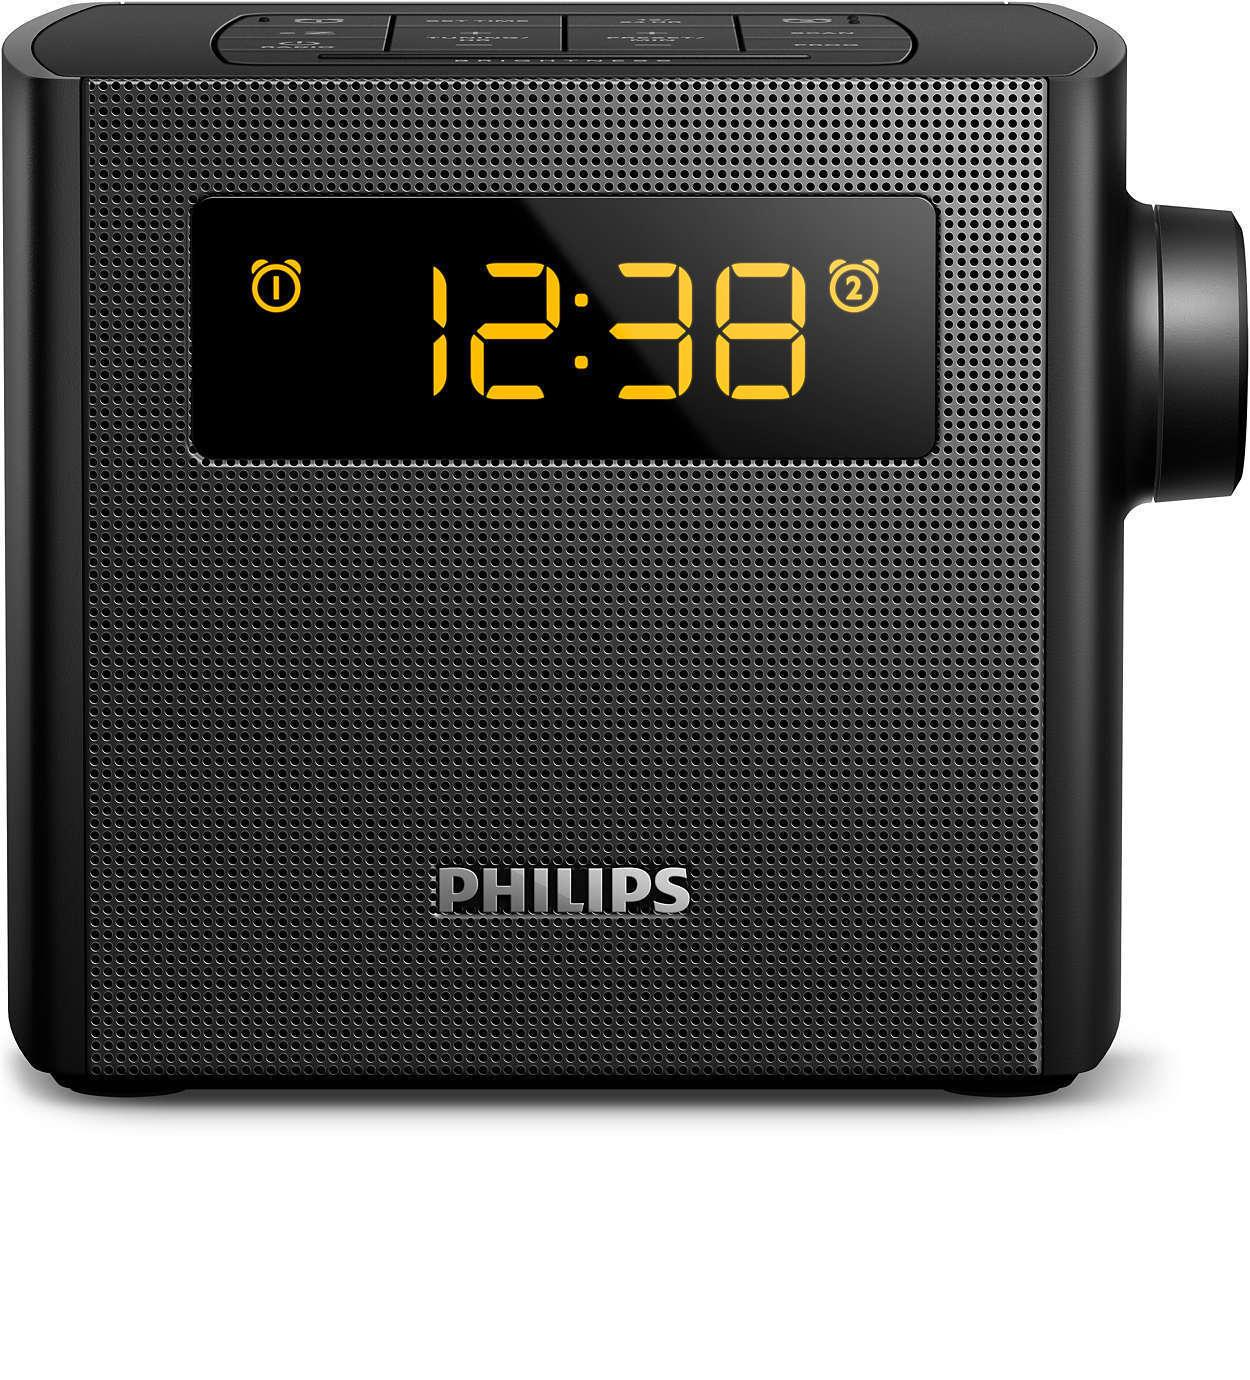 PHILIPS AJ4300B Clock Radio AJ4300 B FM Digital tuning Dual alarm Time & alarm